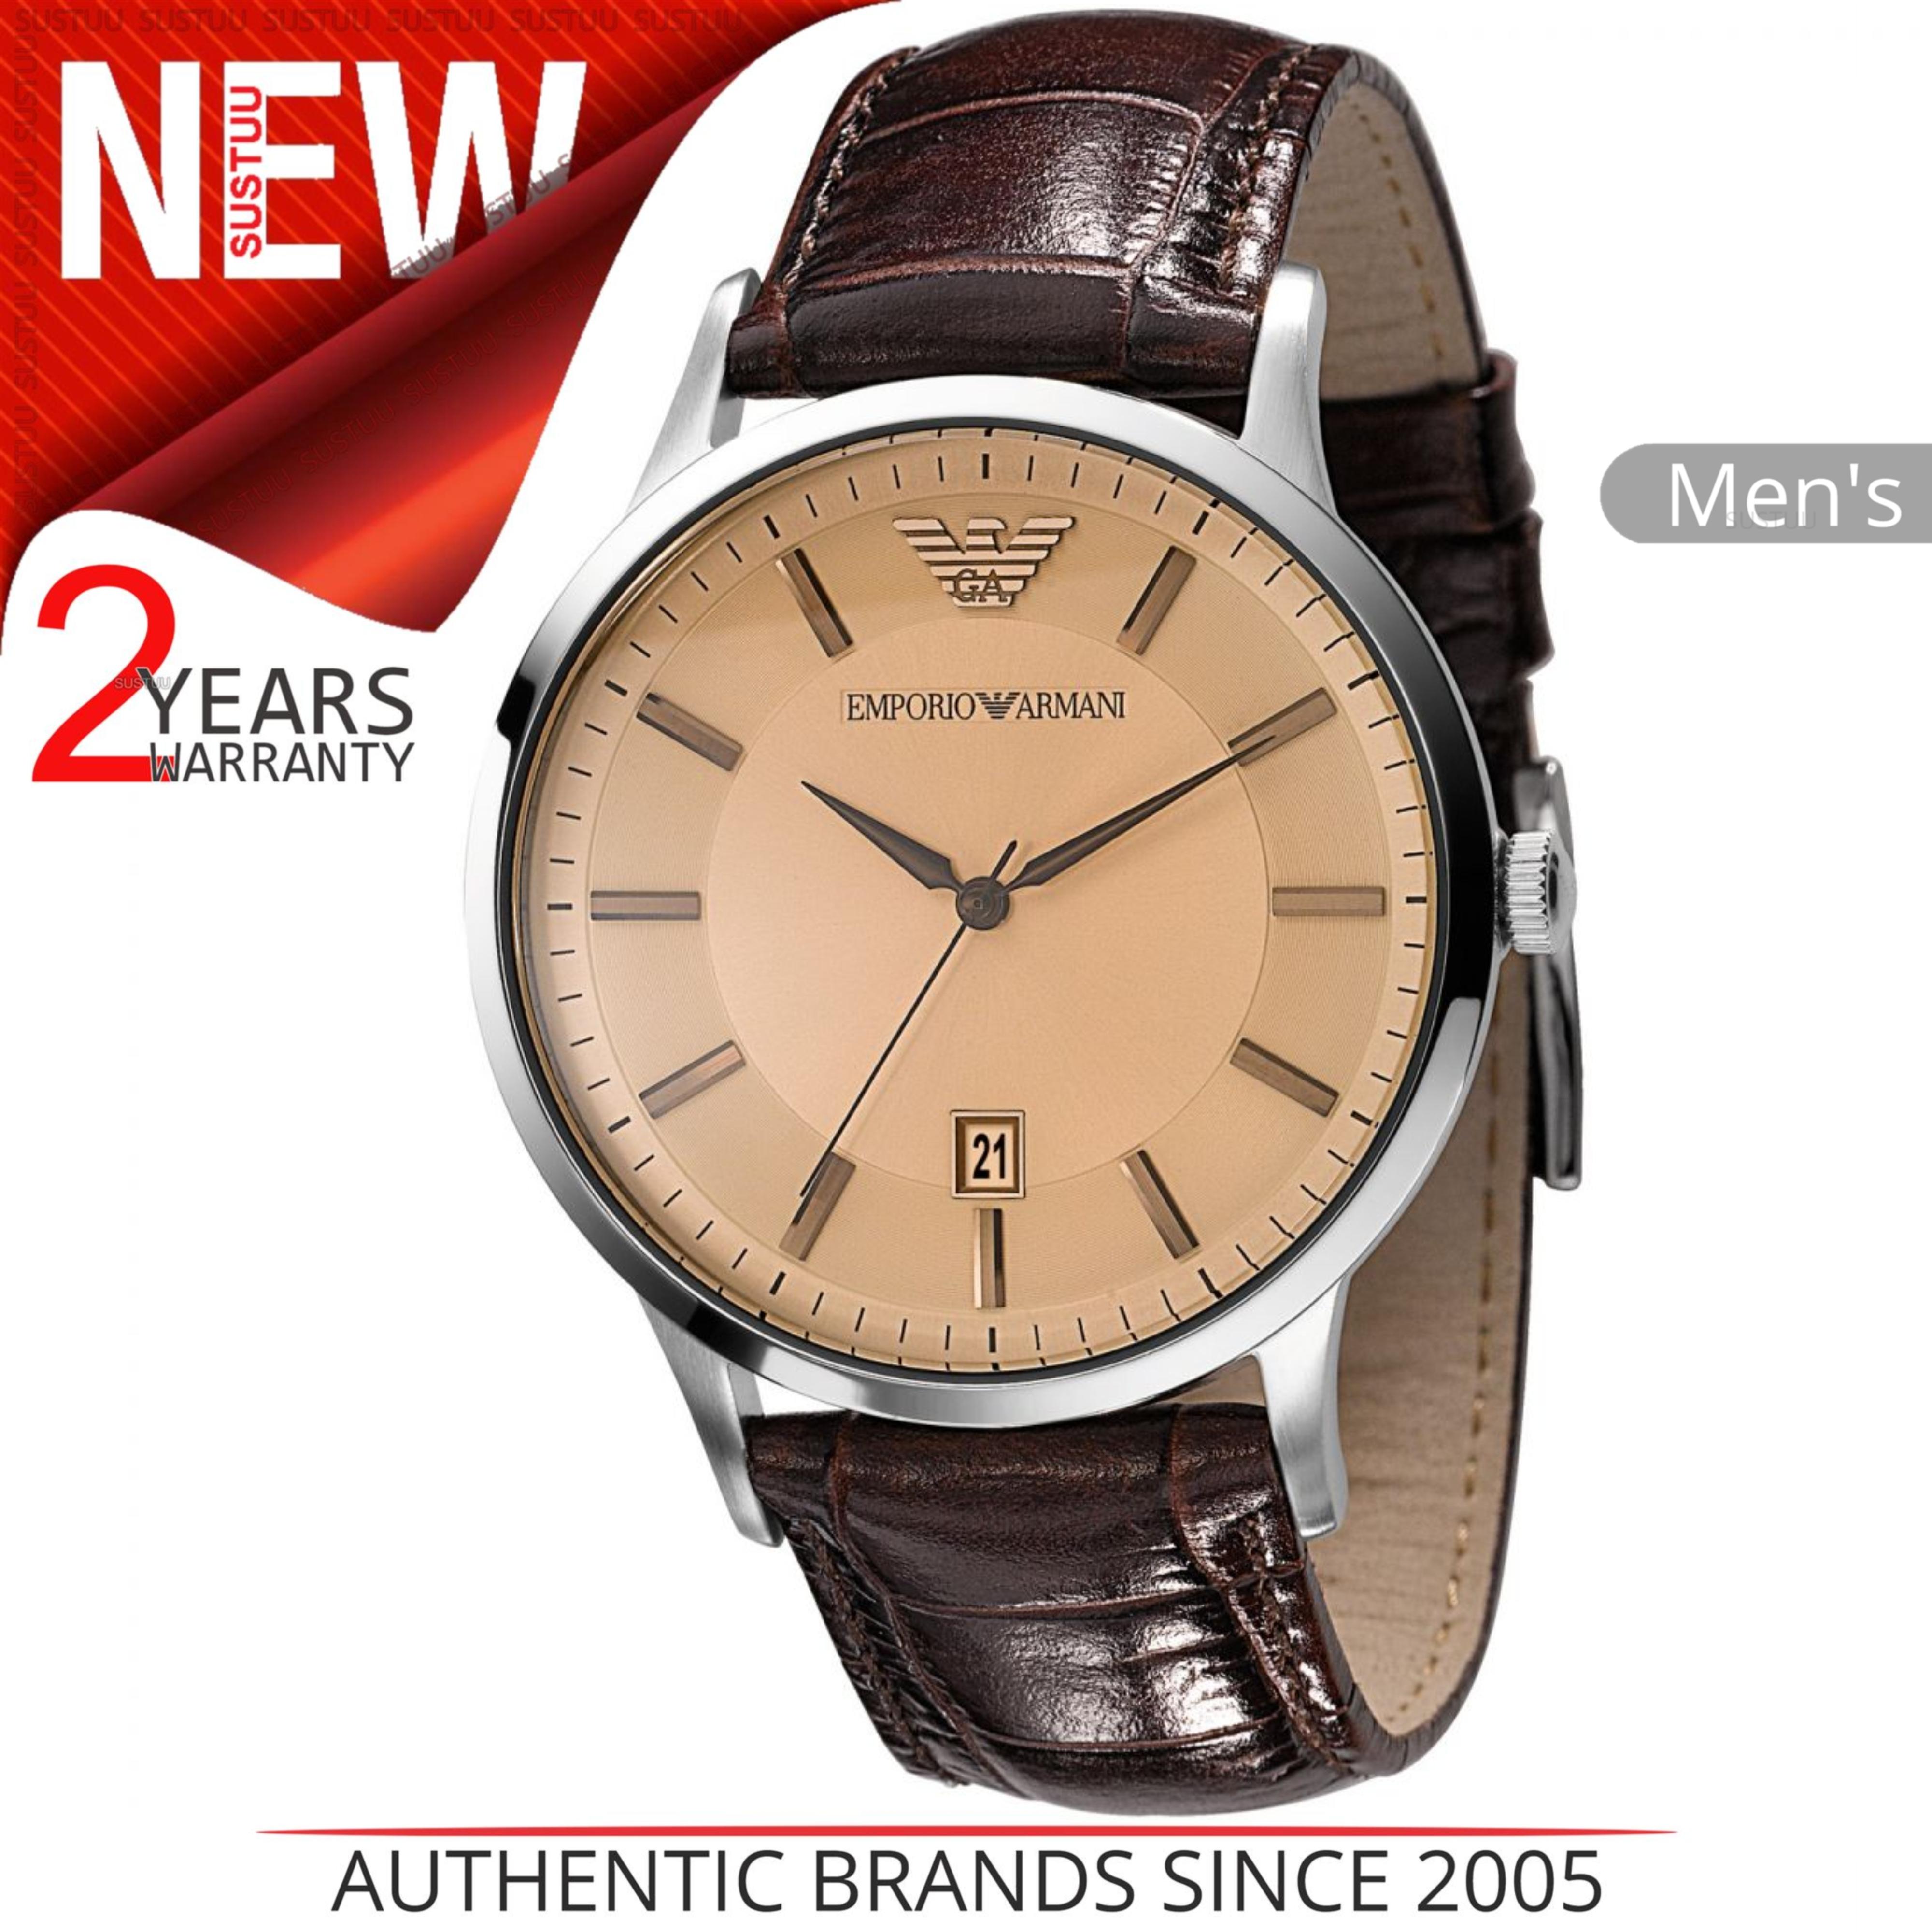 e8190fa0376f CENTINELA Reloj Emporio Armani Classic para hombre AR2427 Dial de color  salmón redondo Correa de cuero marrón